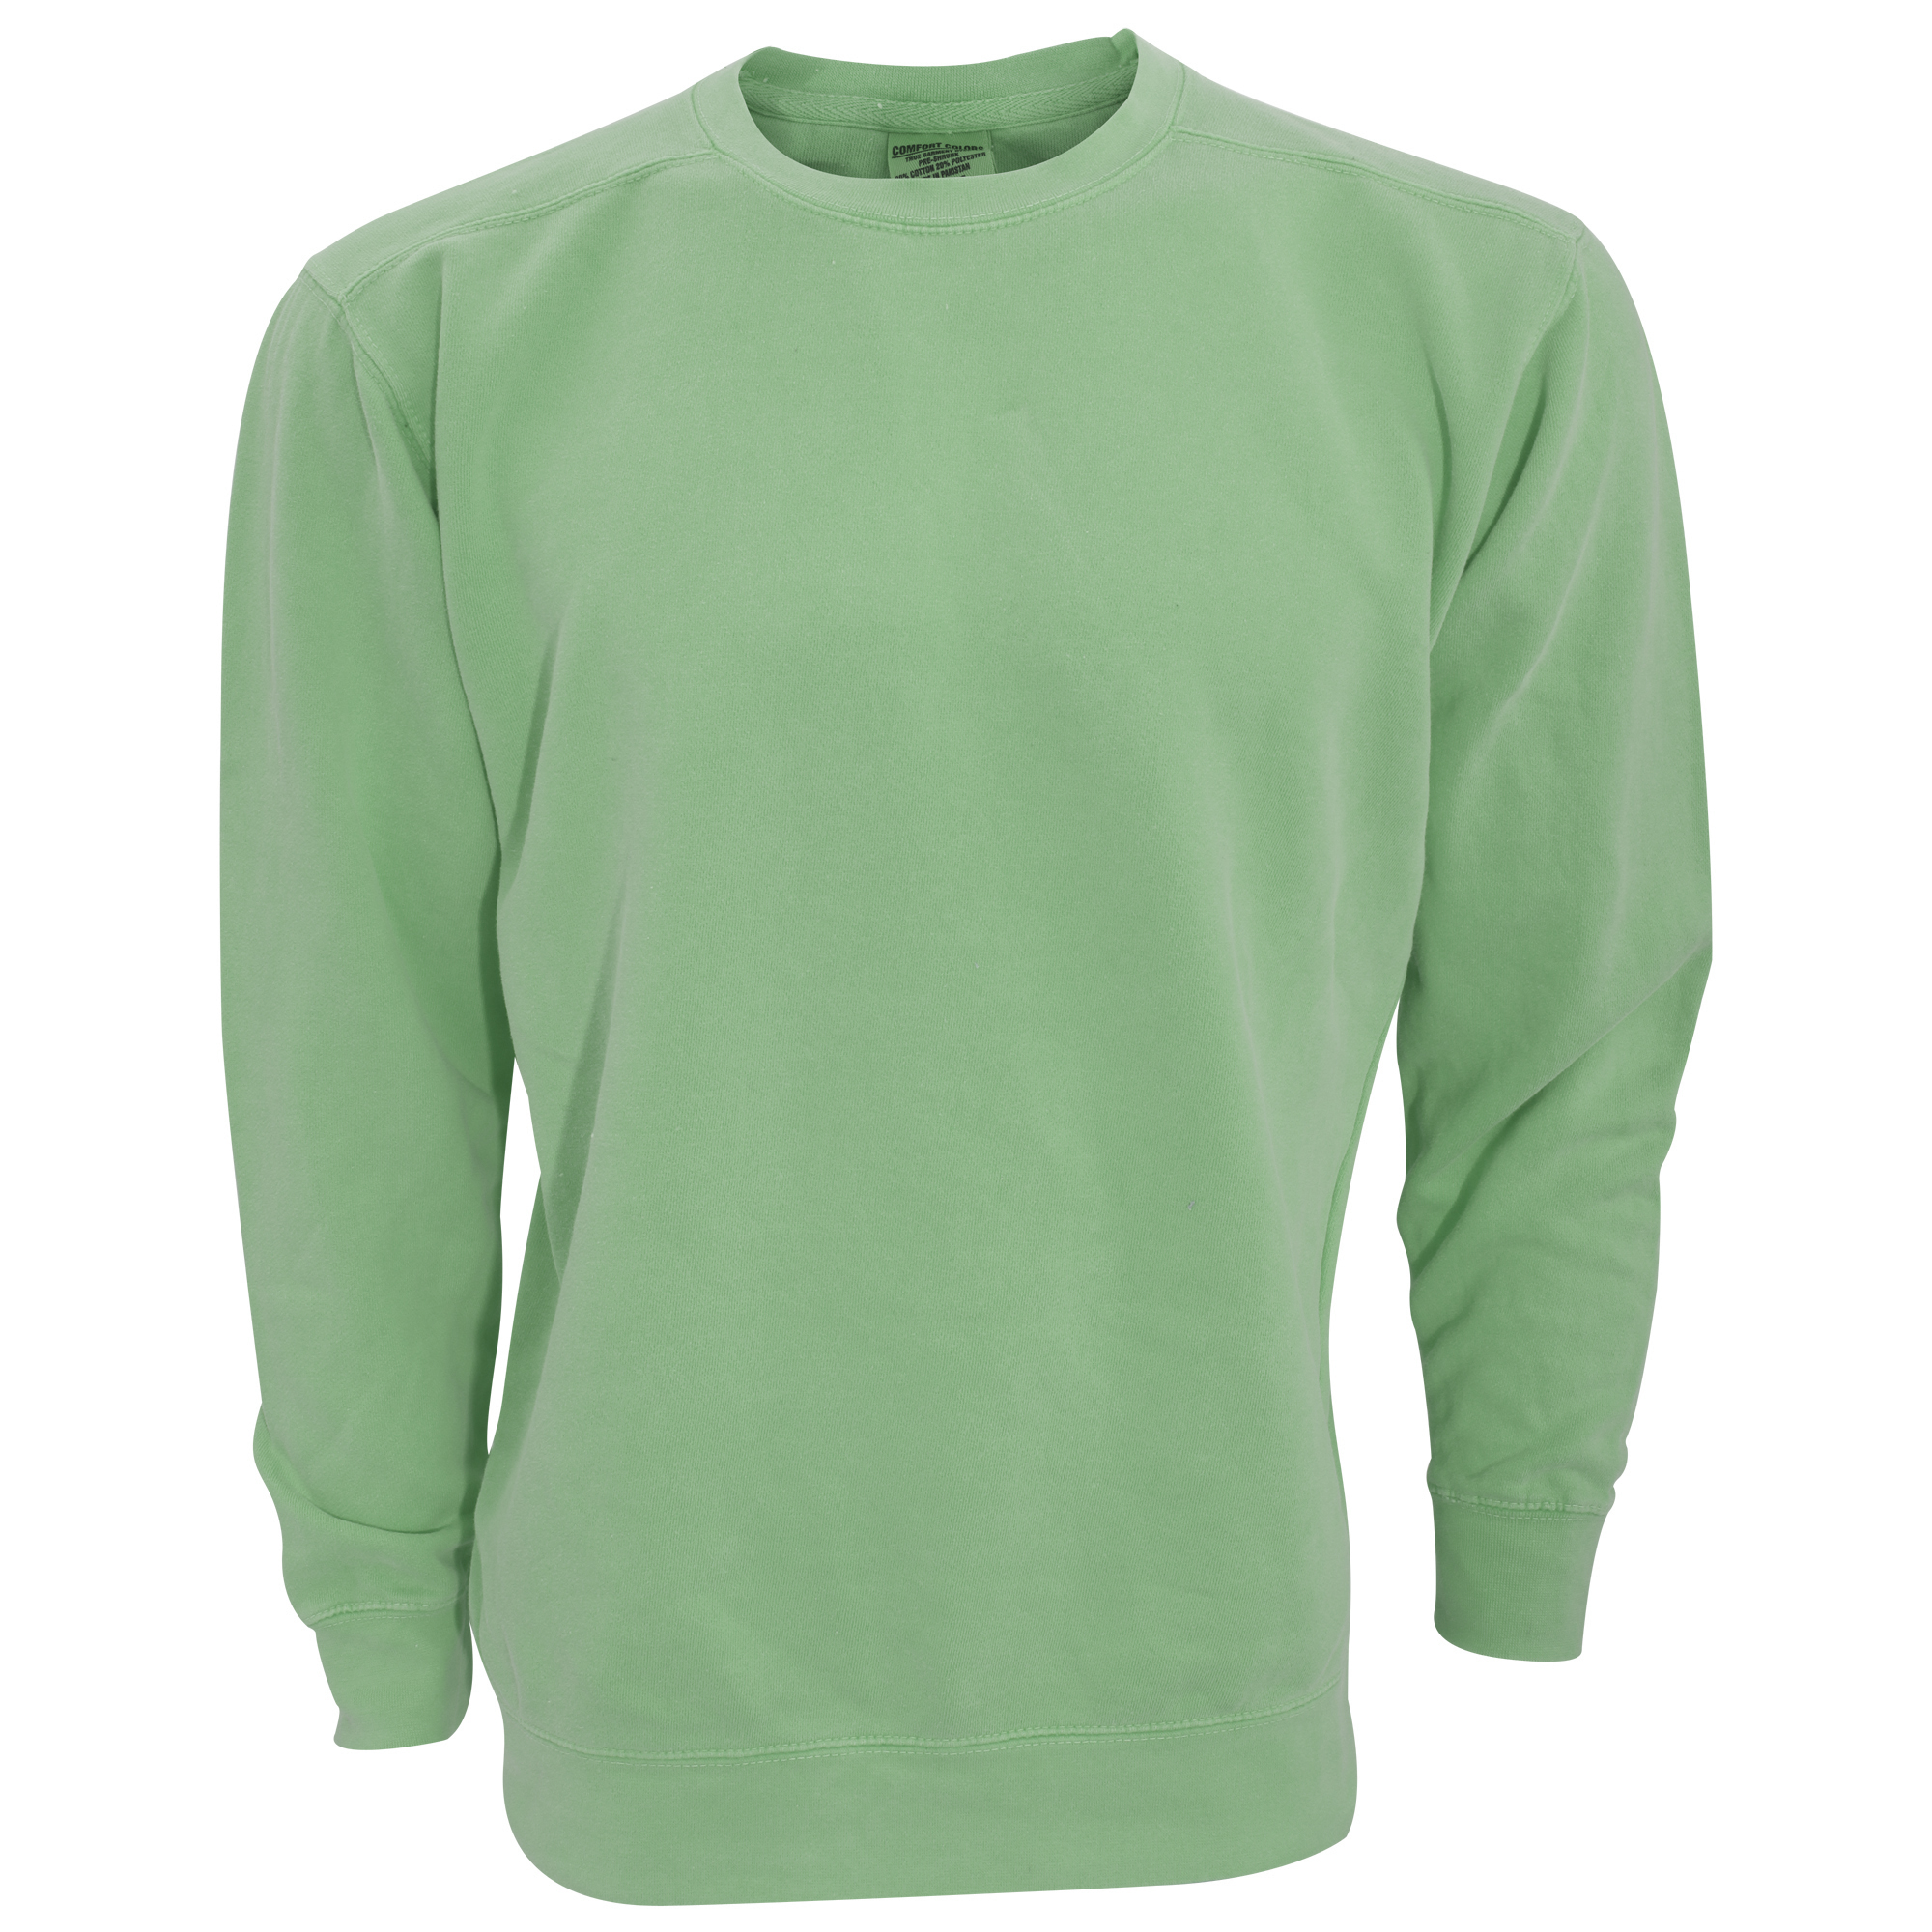 Comfort Colors Adults Unisex Crew Neck Sweatshirt Ebay